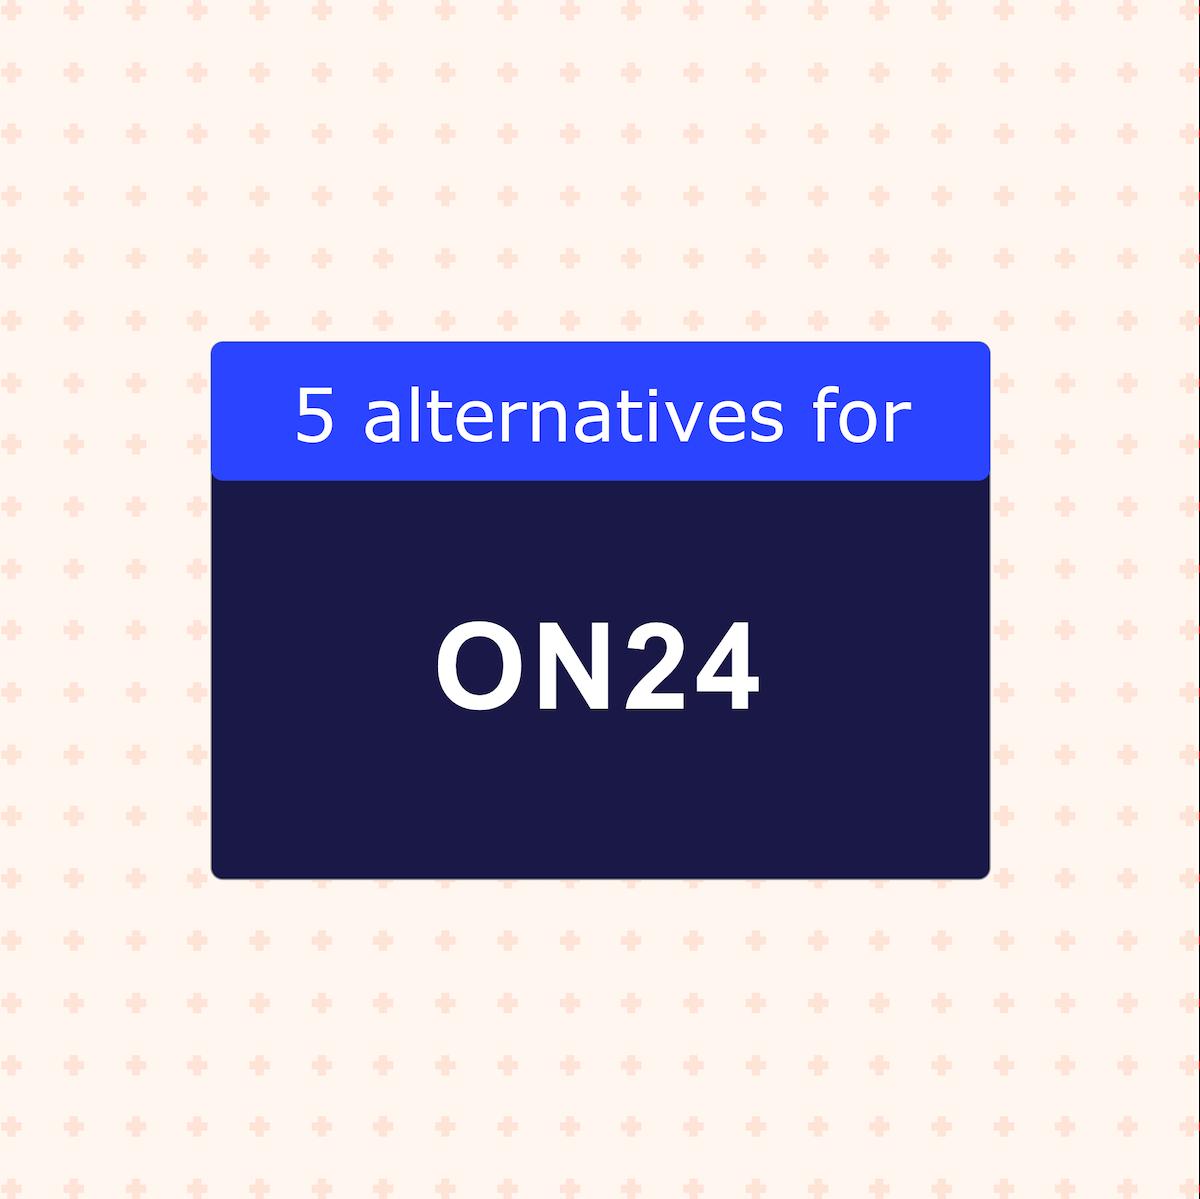 https://spotme.com/wp-content/uploads/2020/07/ON24-alternatives.png